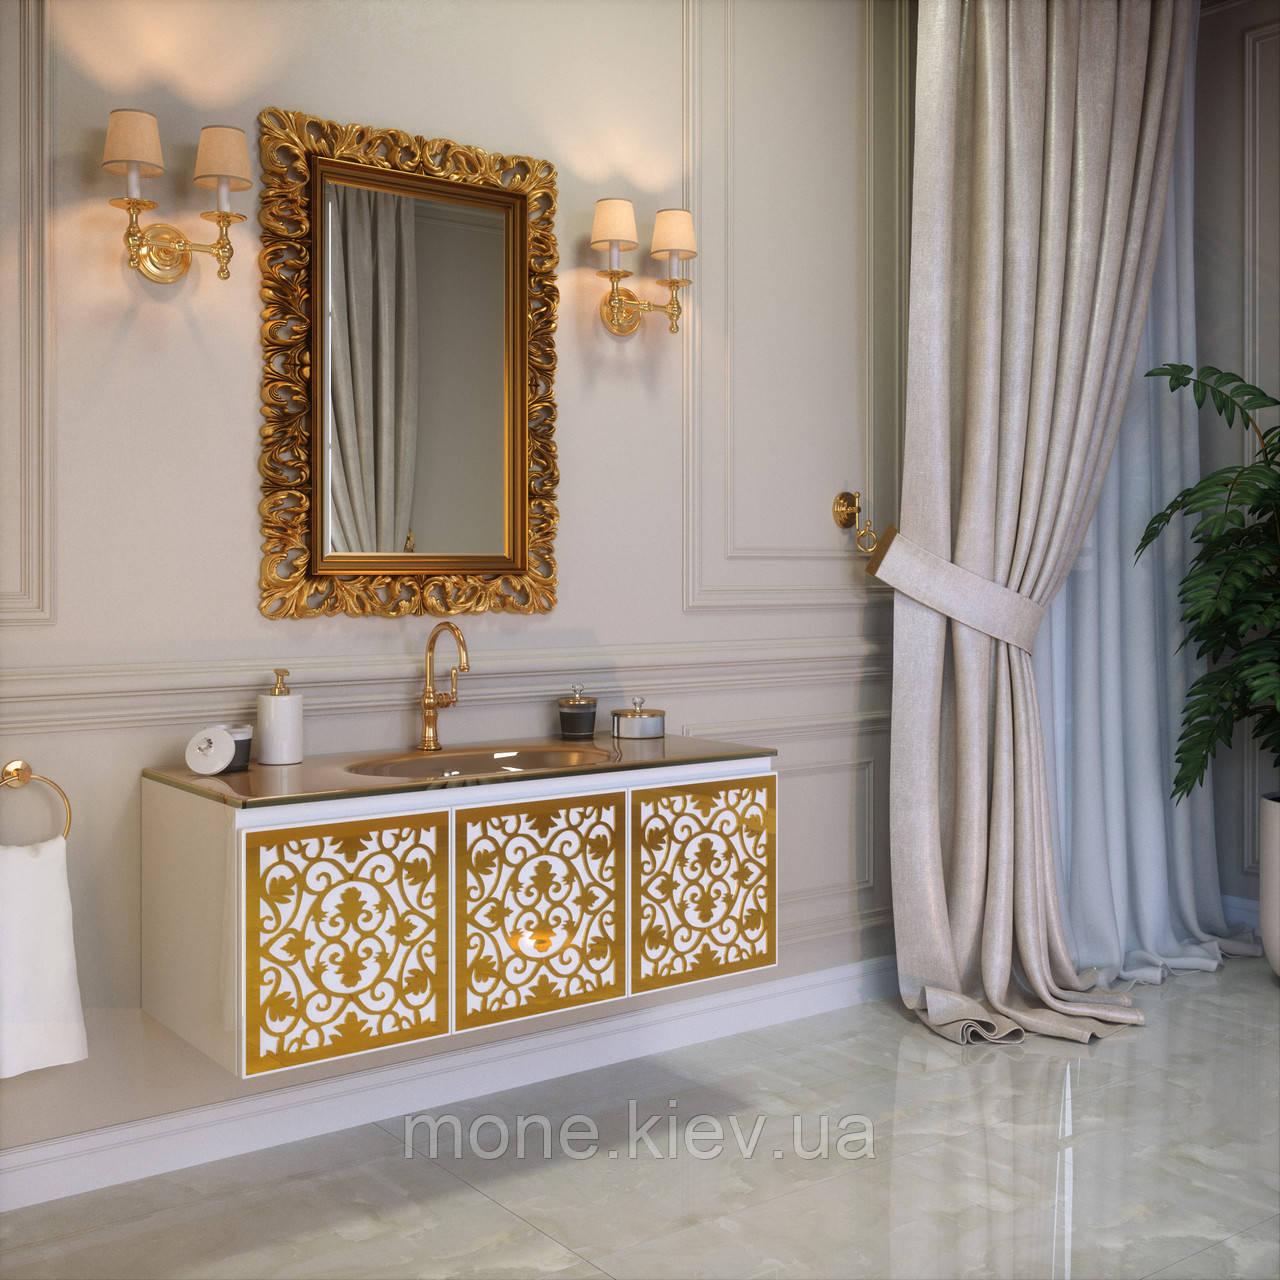 "Комплект мебели в ванную комнату ""Винсент"" (тумба+раковина + зеркало)"